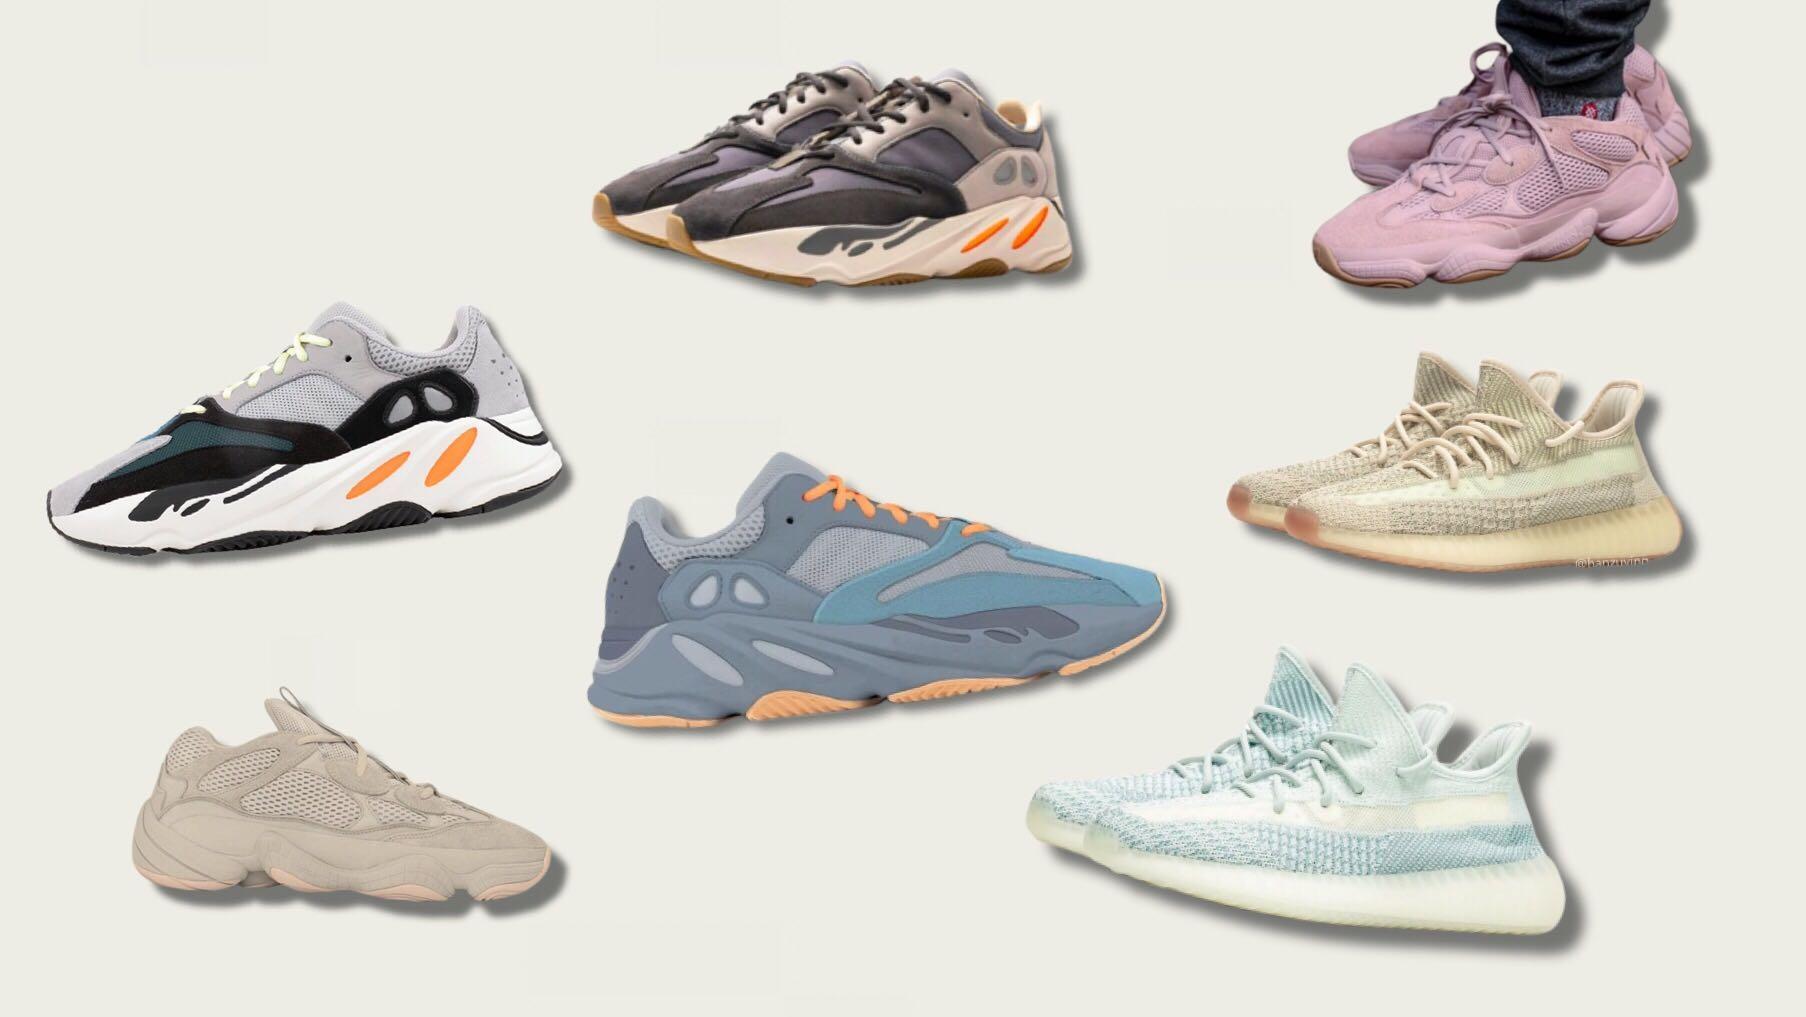 adidas-yeezy-releases-2019